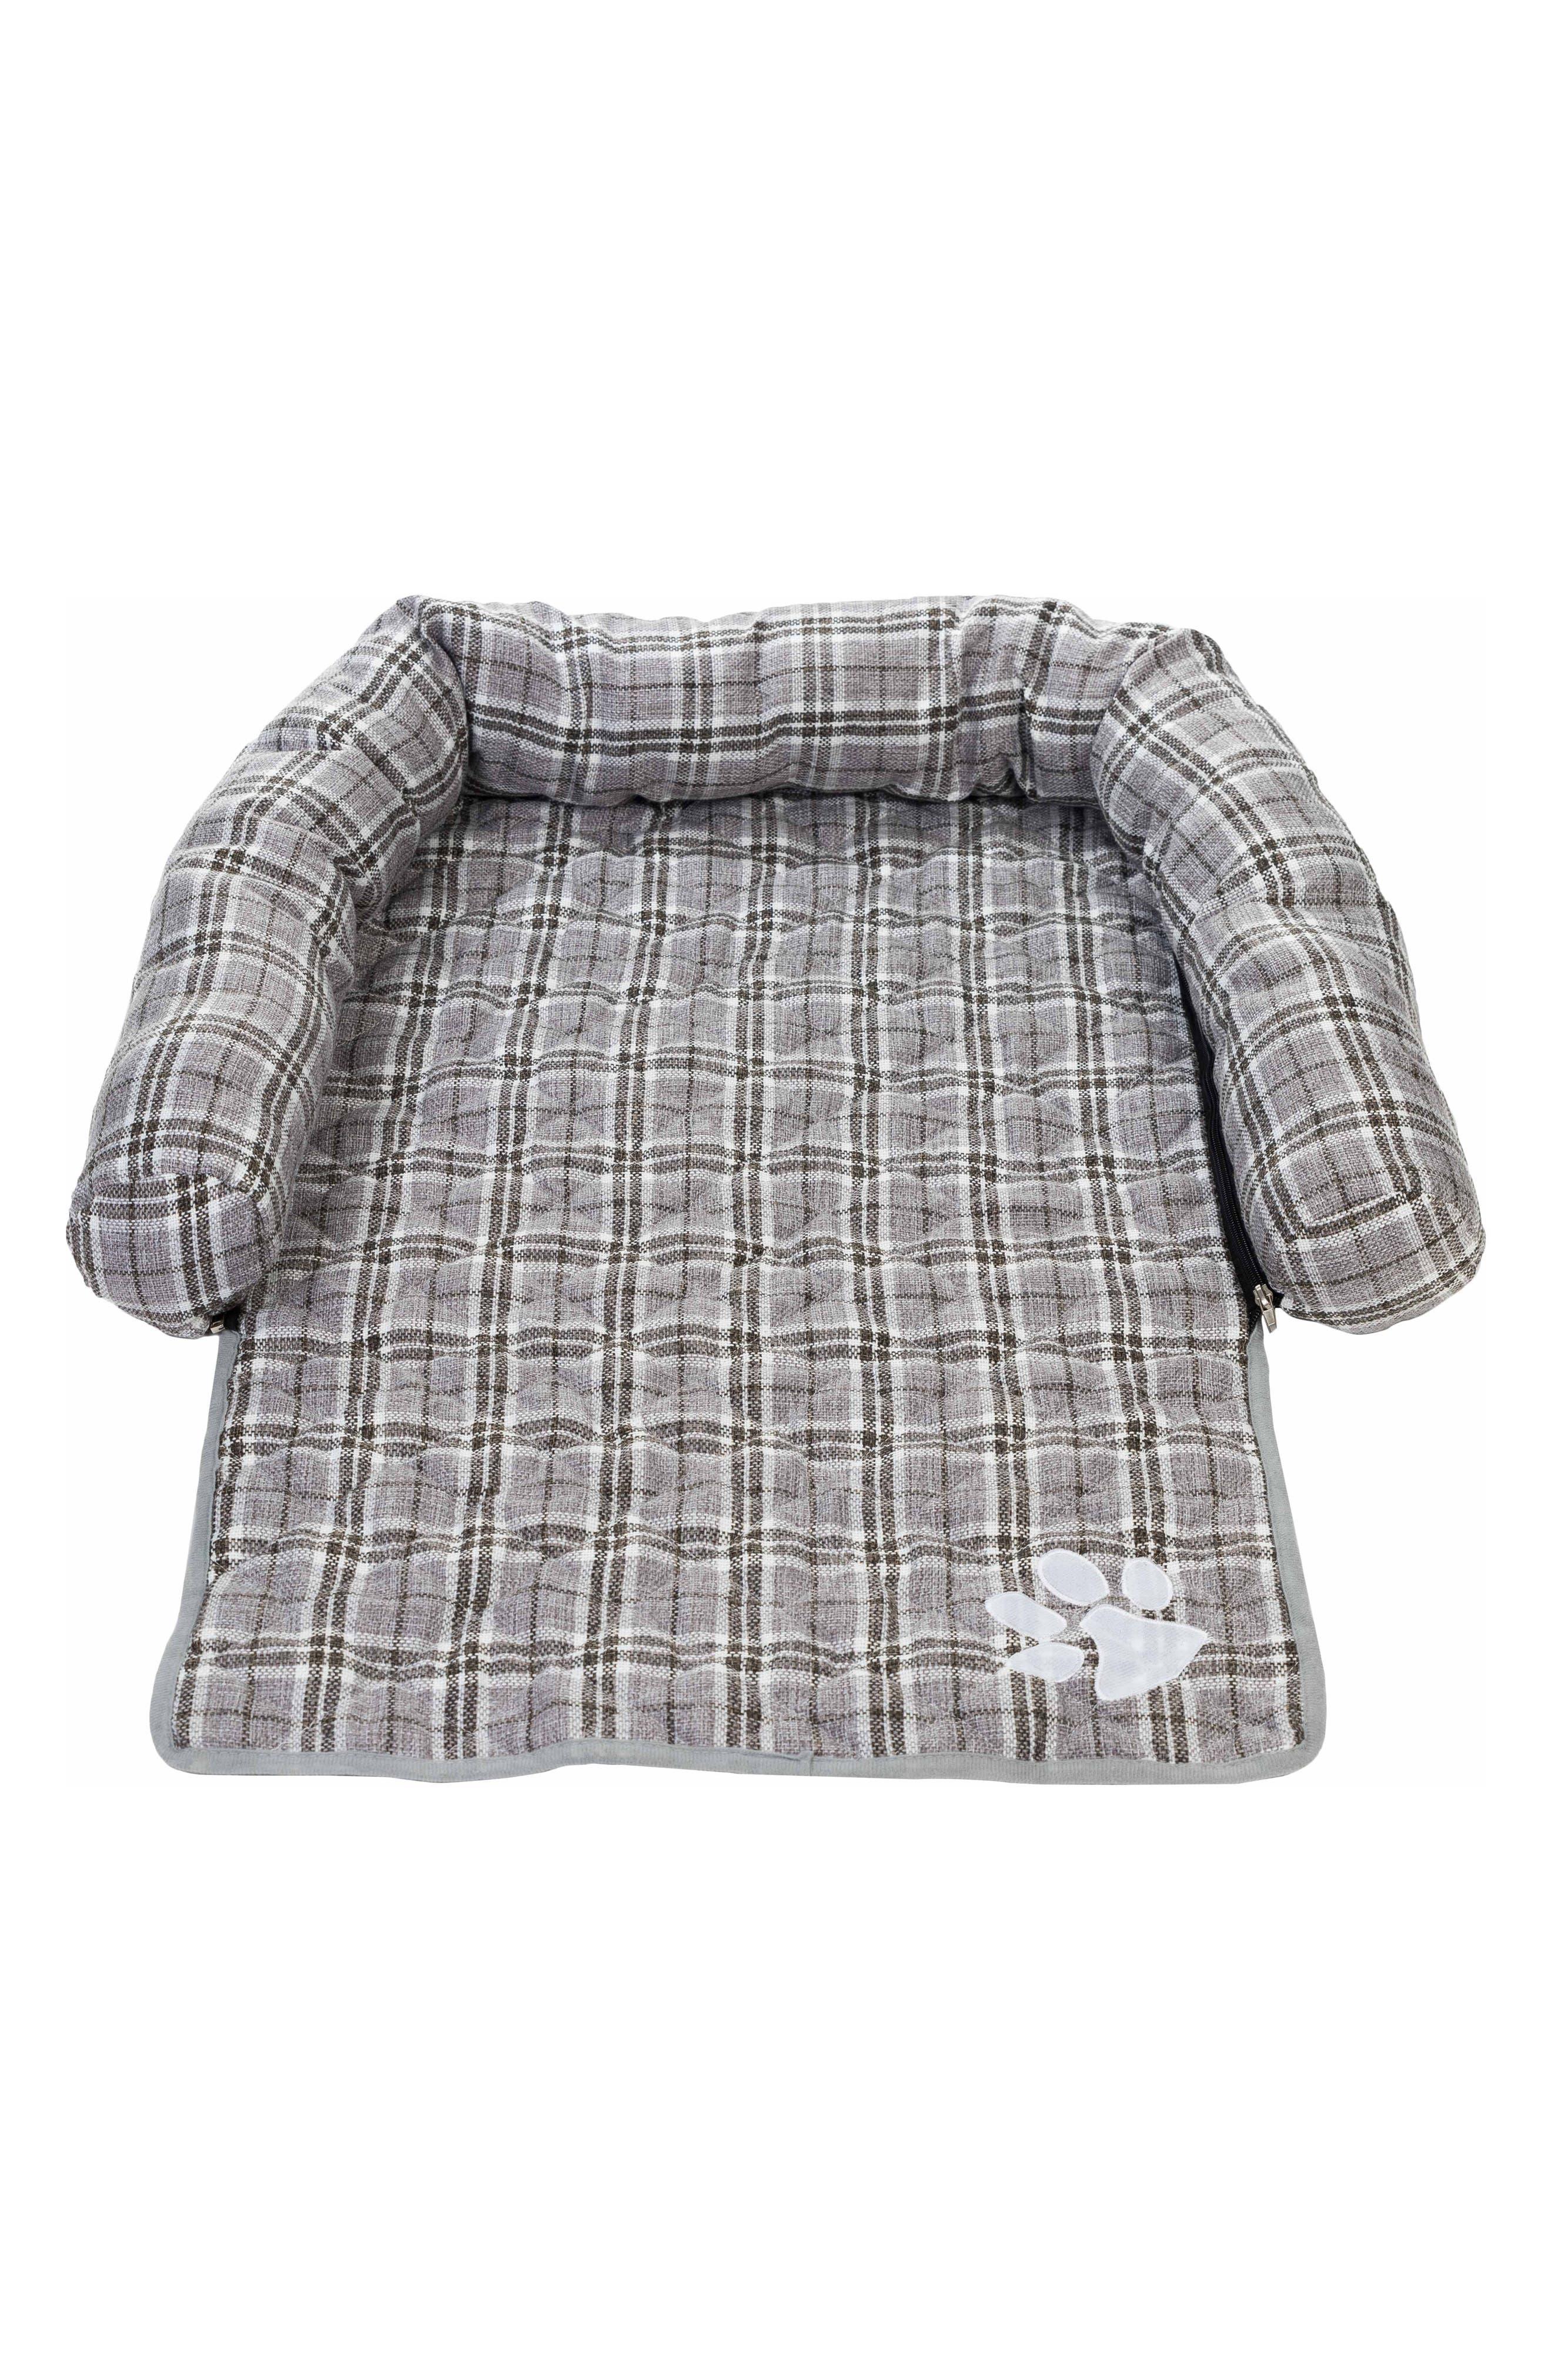 Harlee Reversible Pet Chair Cover,                         Main,                         color, Grey